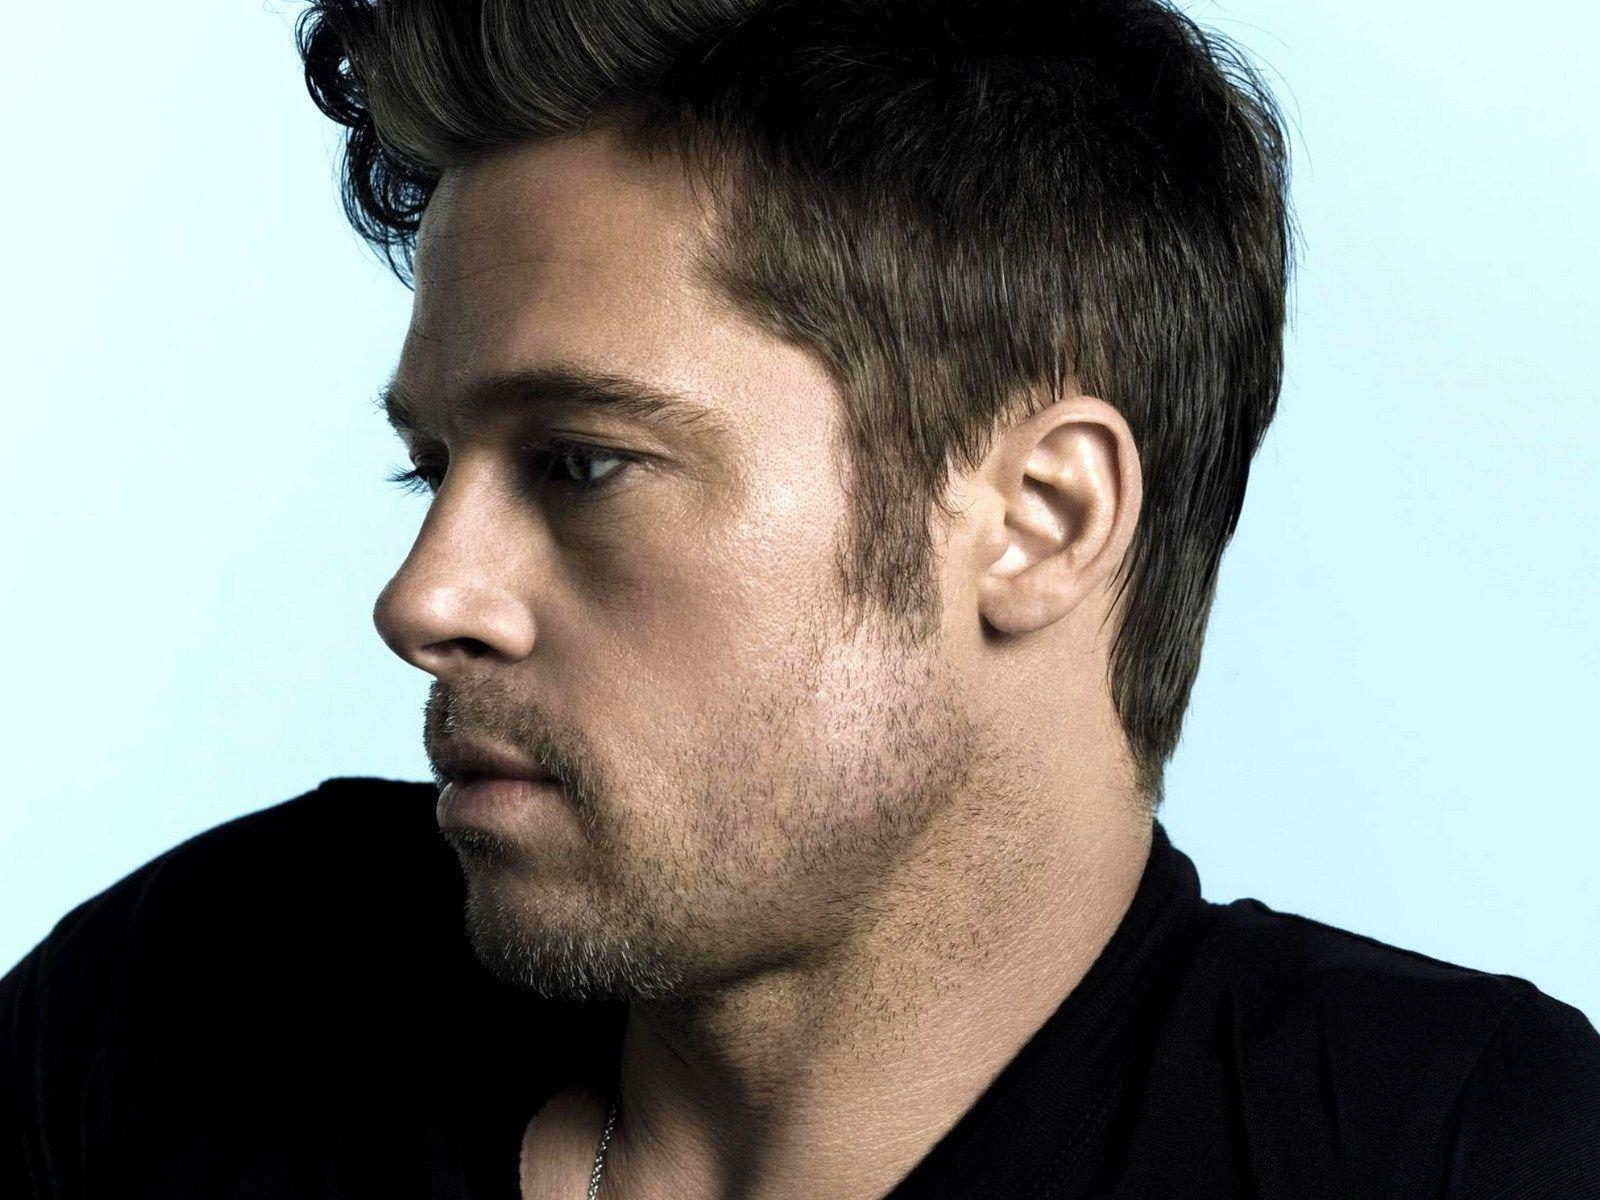 Brad Pitt Wallpapers - Wallpaper Cave - photo #20